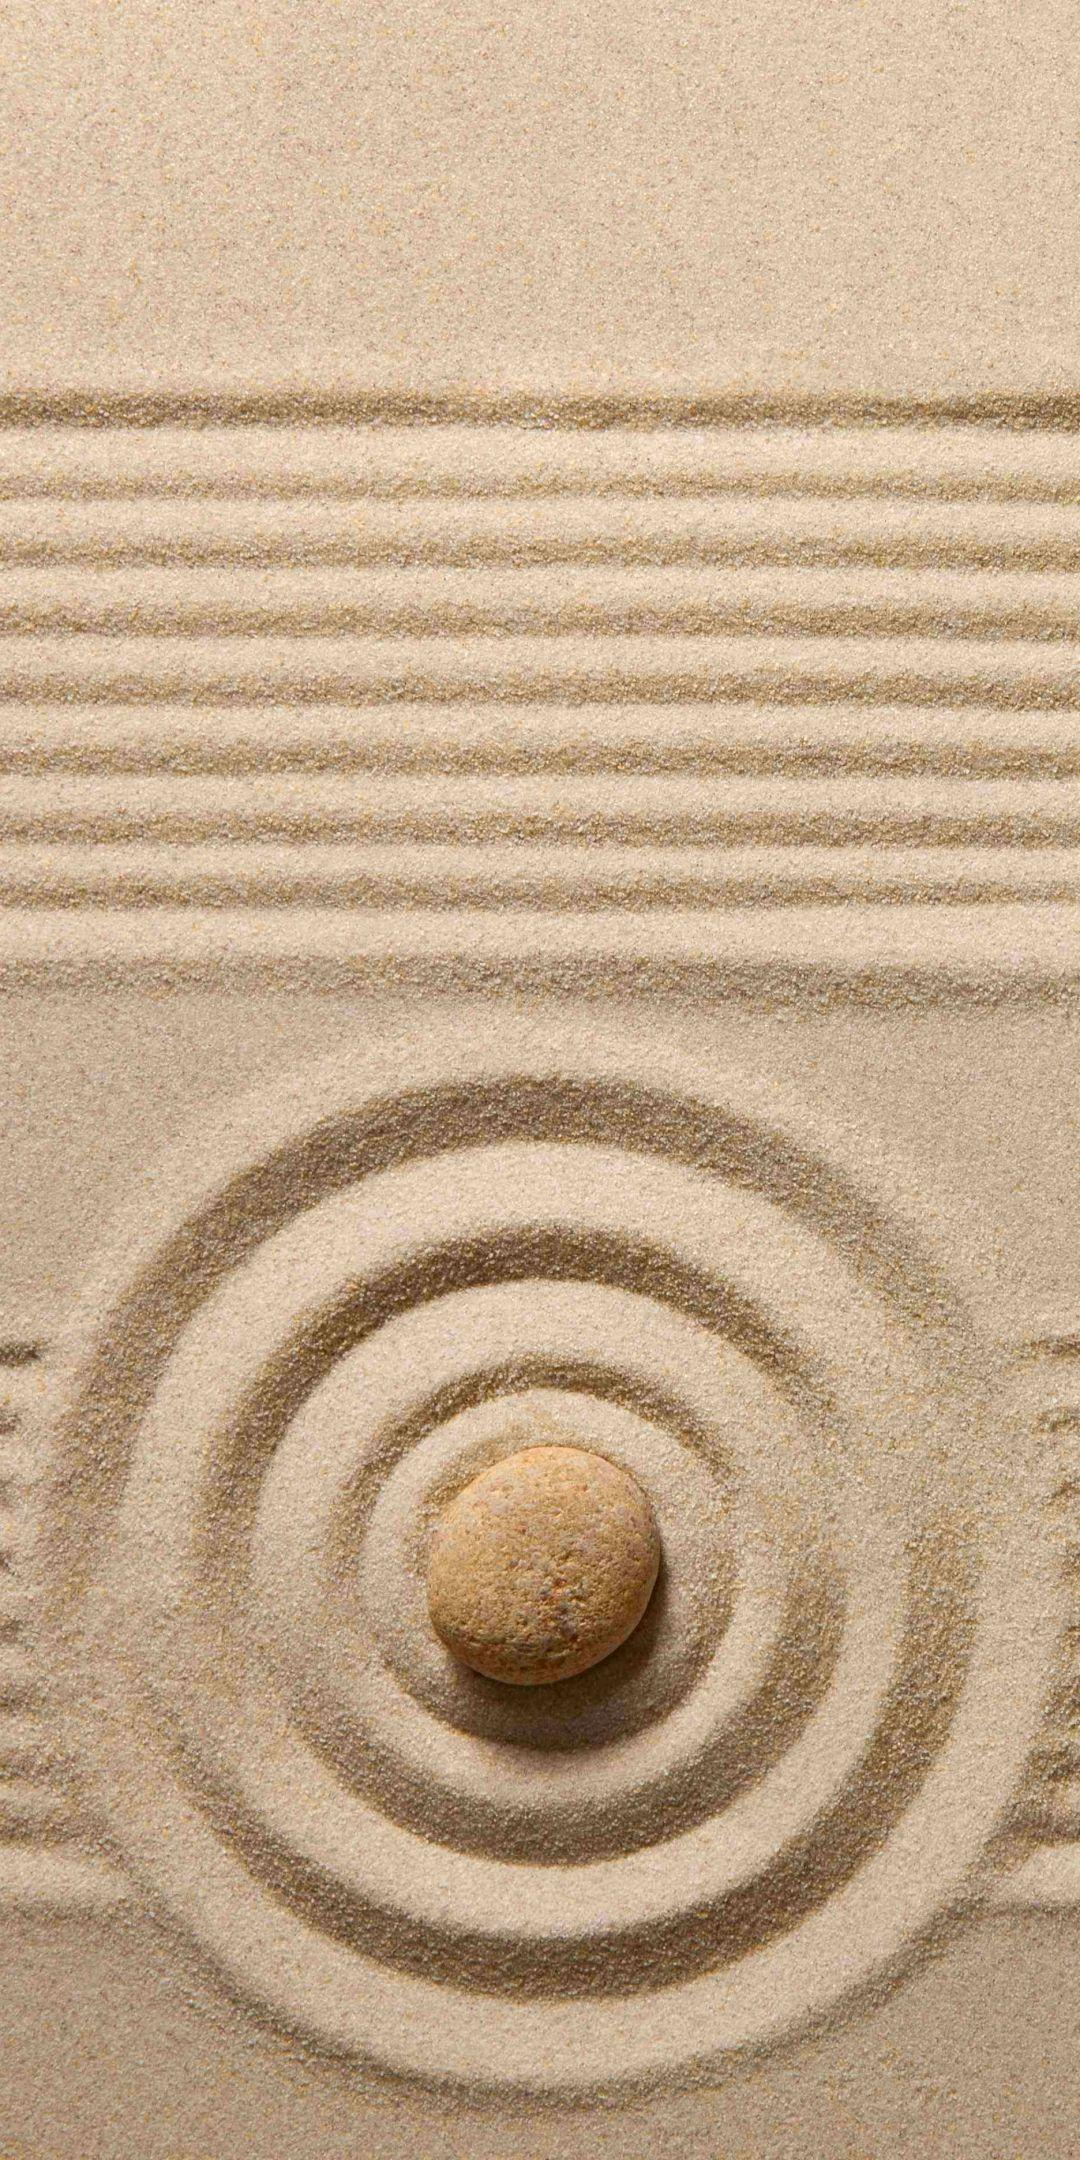 A Zen garden is a wellknown and increasingly popular Form